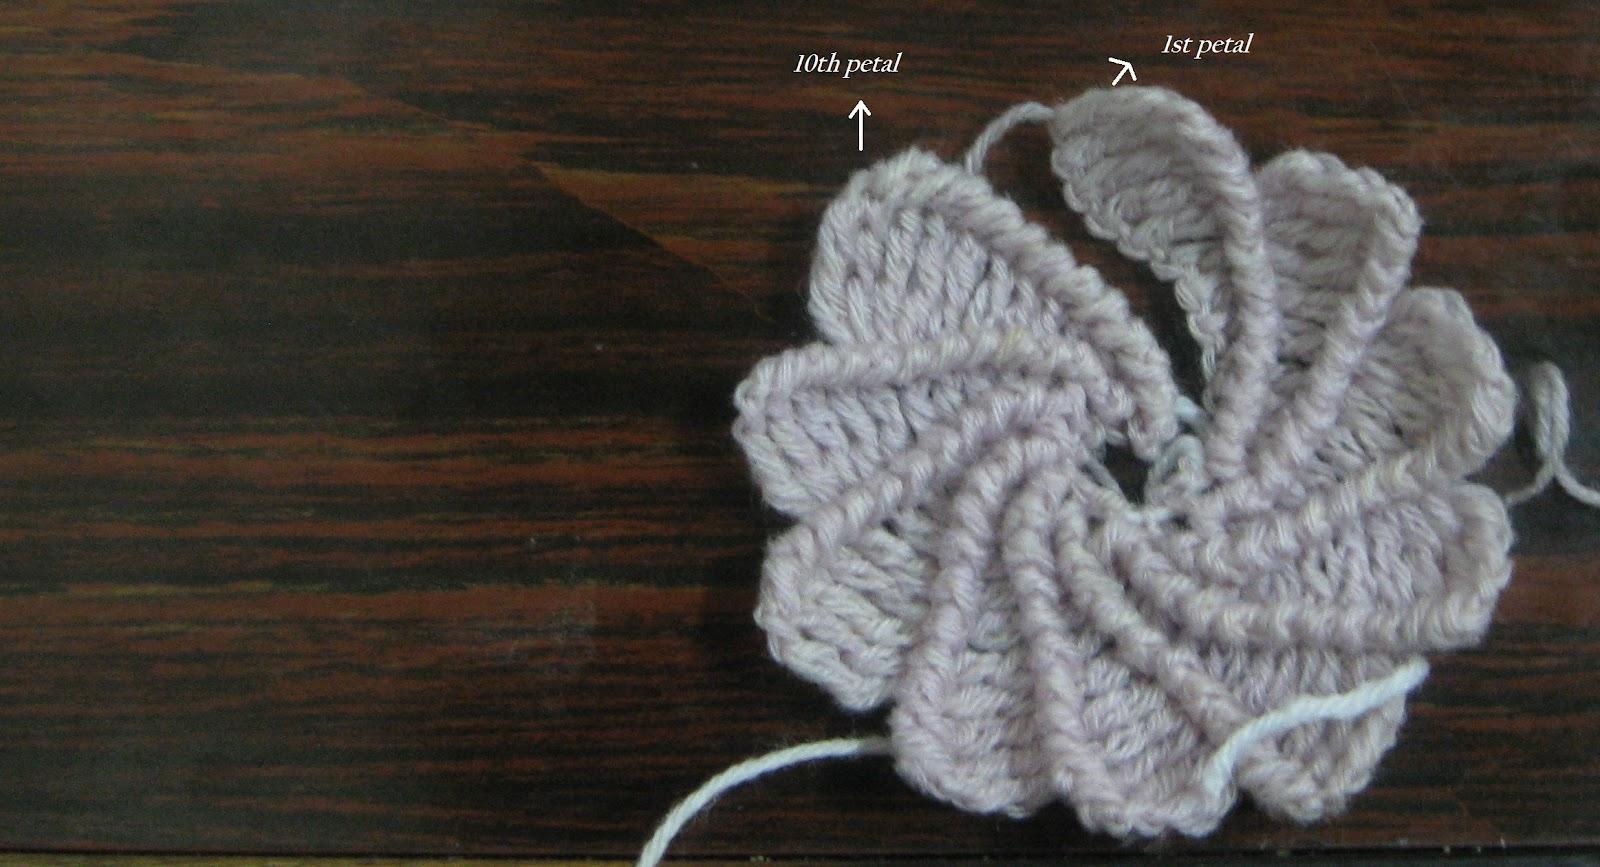 The Crochet Charm: Spiral Flower Pattern